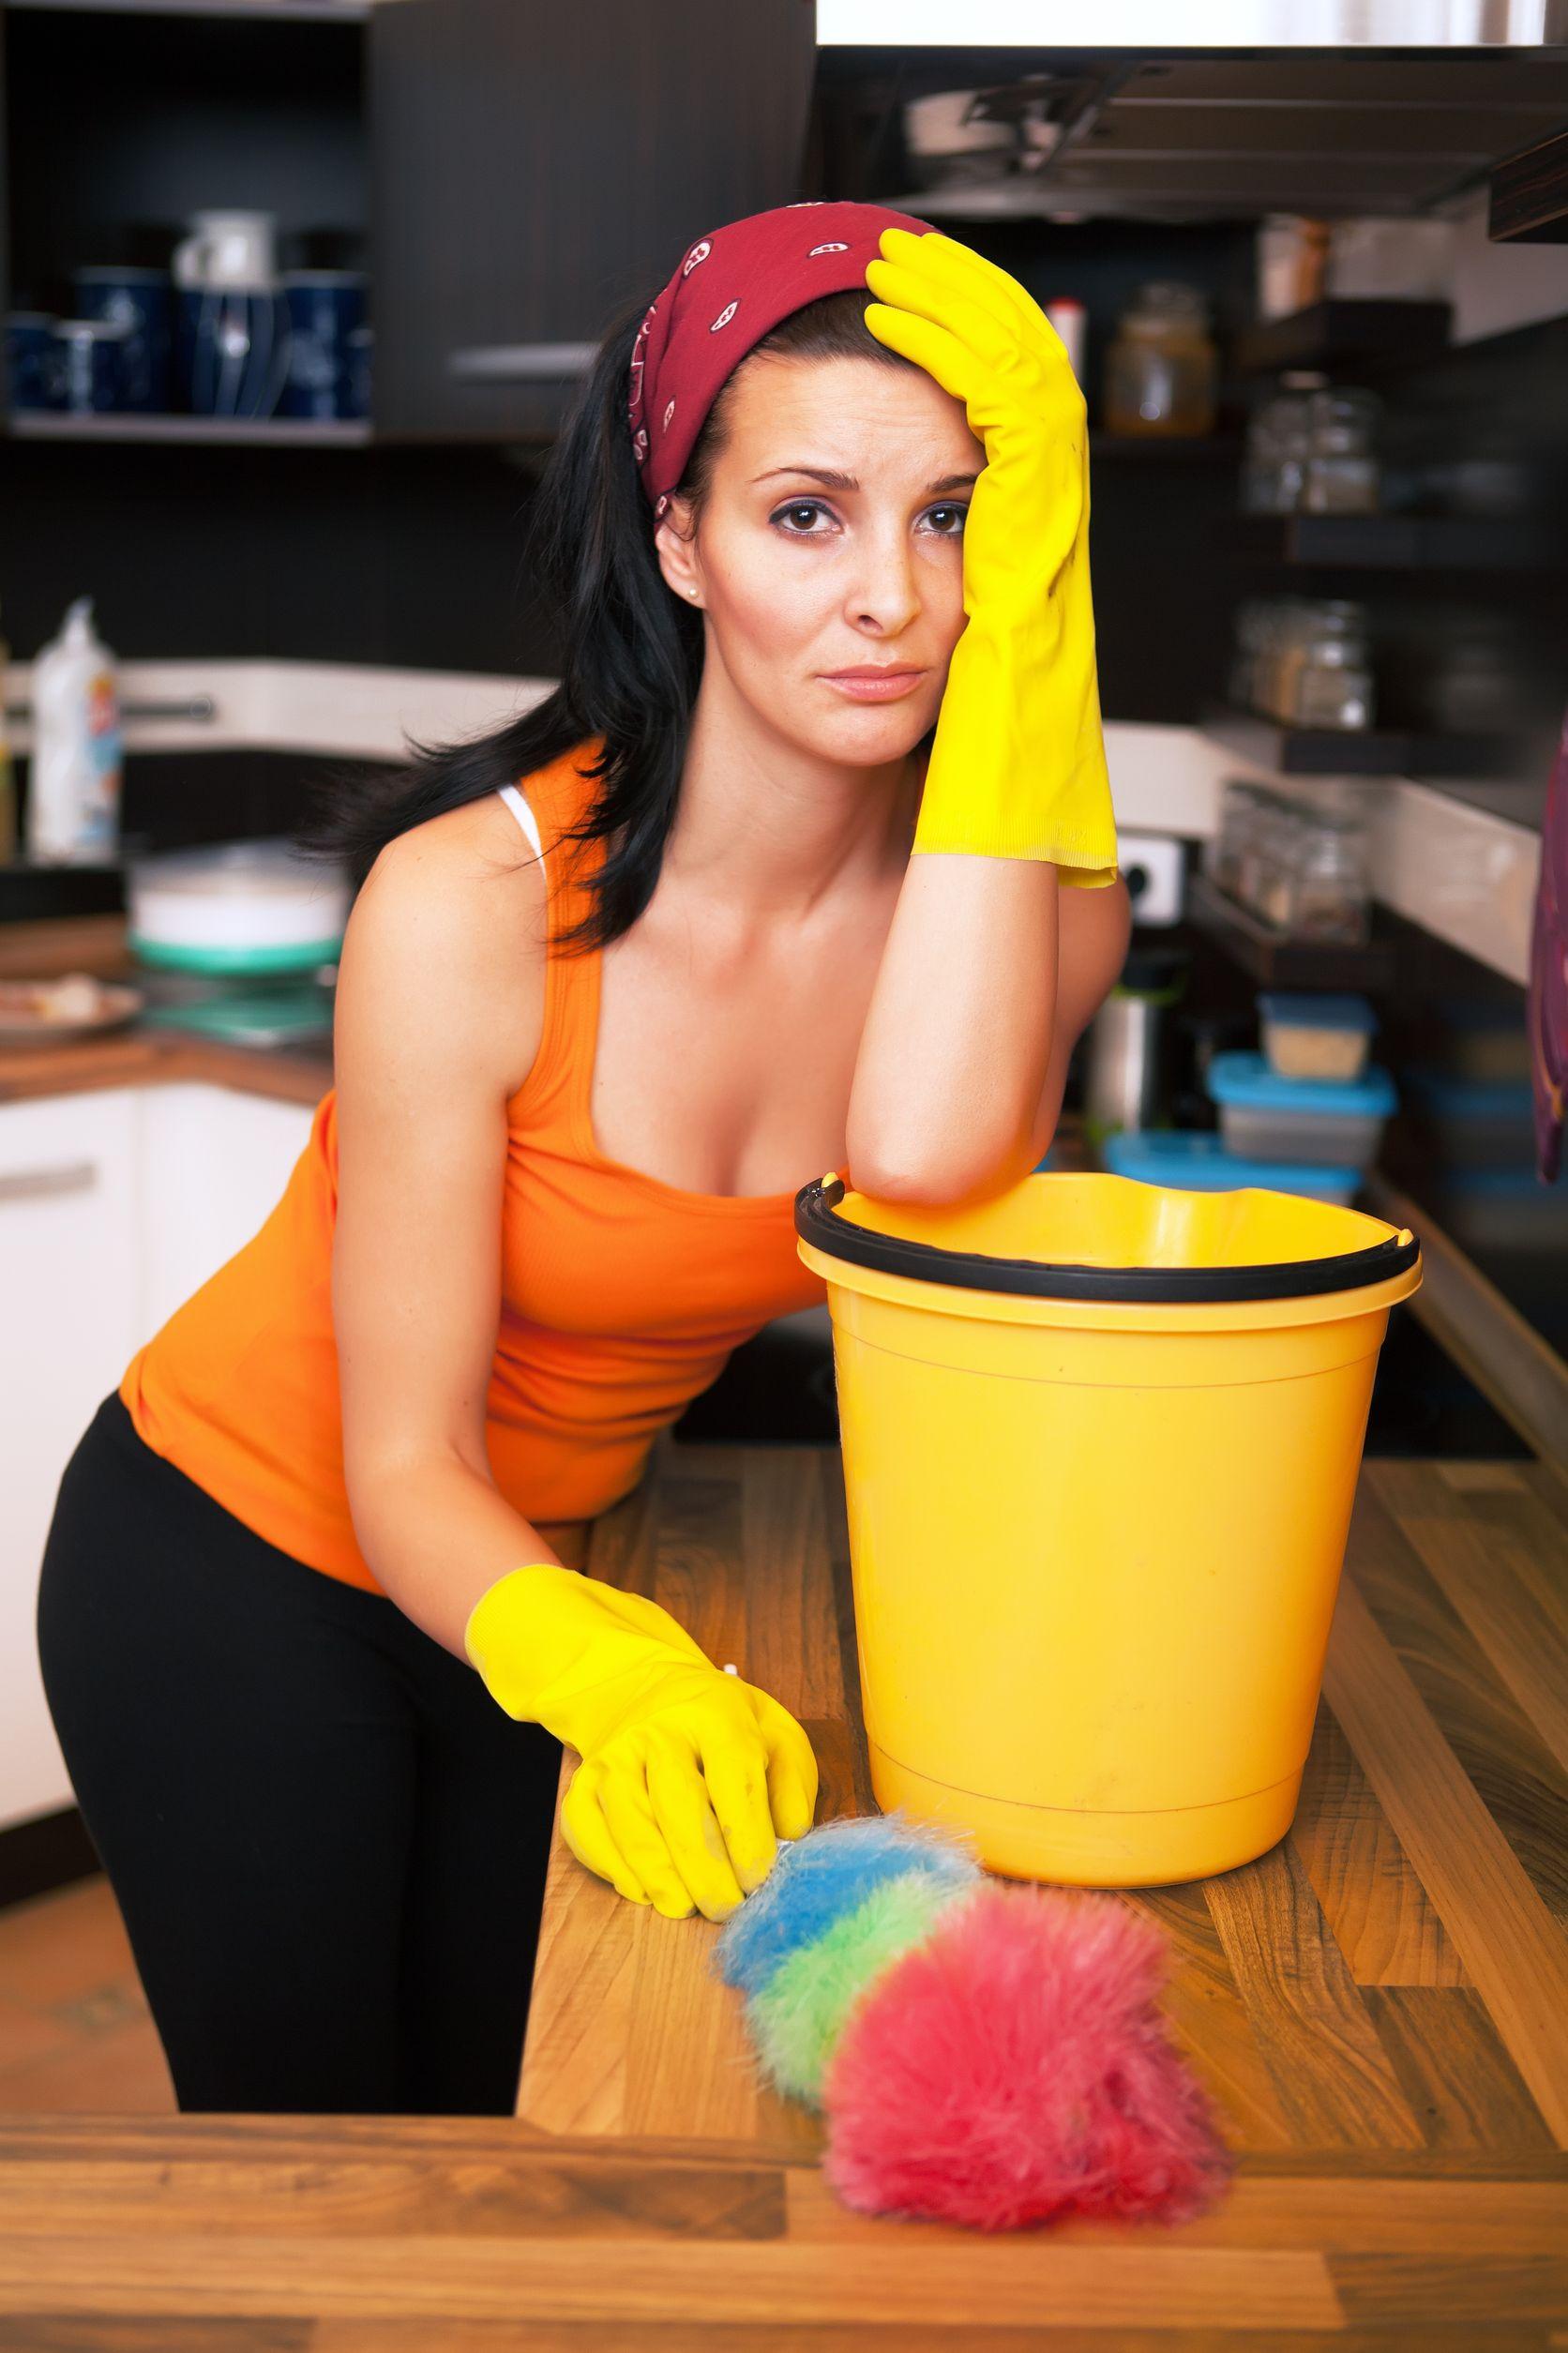 Bangkok thai teen Obedient cleaning lady  Redtube Free